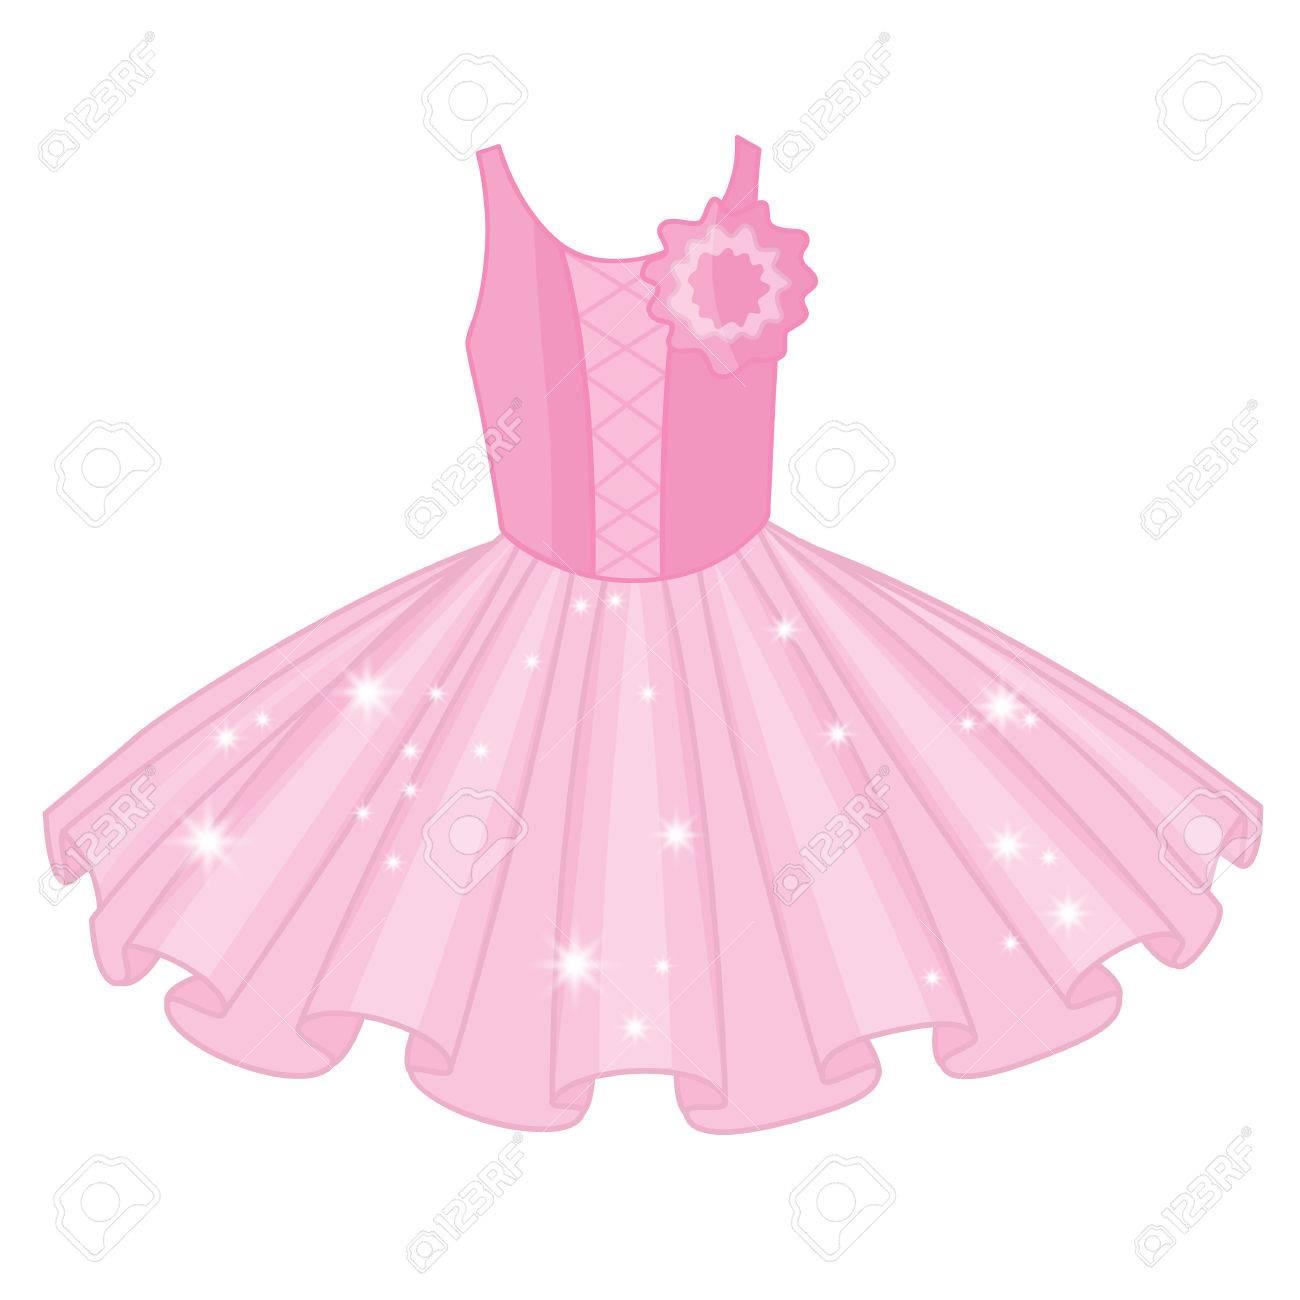 bd4df4b78509 Vector - Vector soft pink tutu dress. Vector ballerina s tutu dresses. Ballet  dress vector illustration